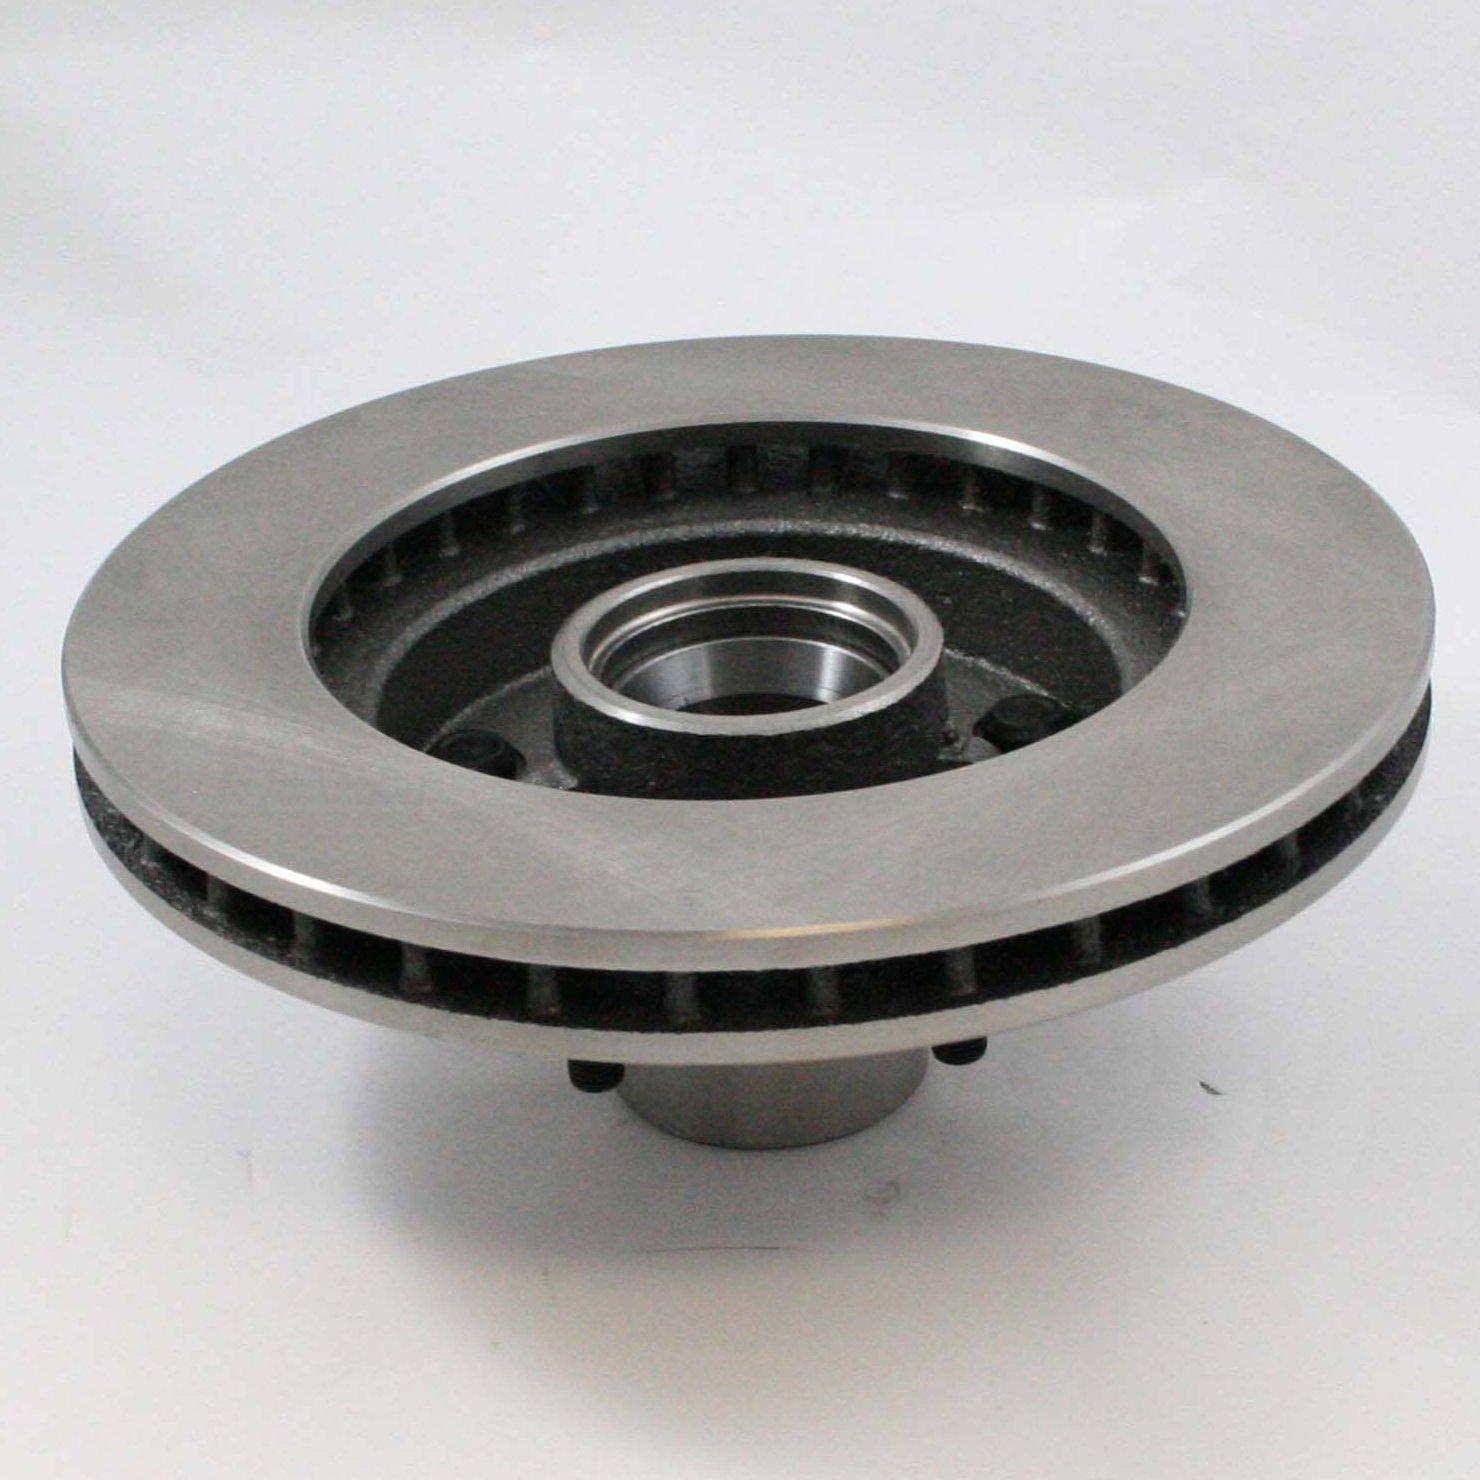 DuraGo BR5549 Front Vented Disc Brake Rotor